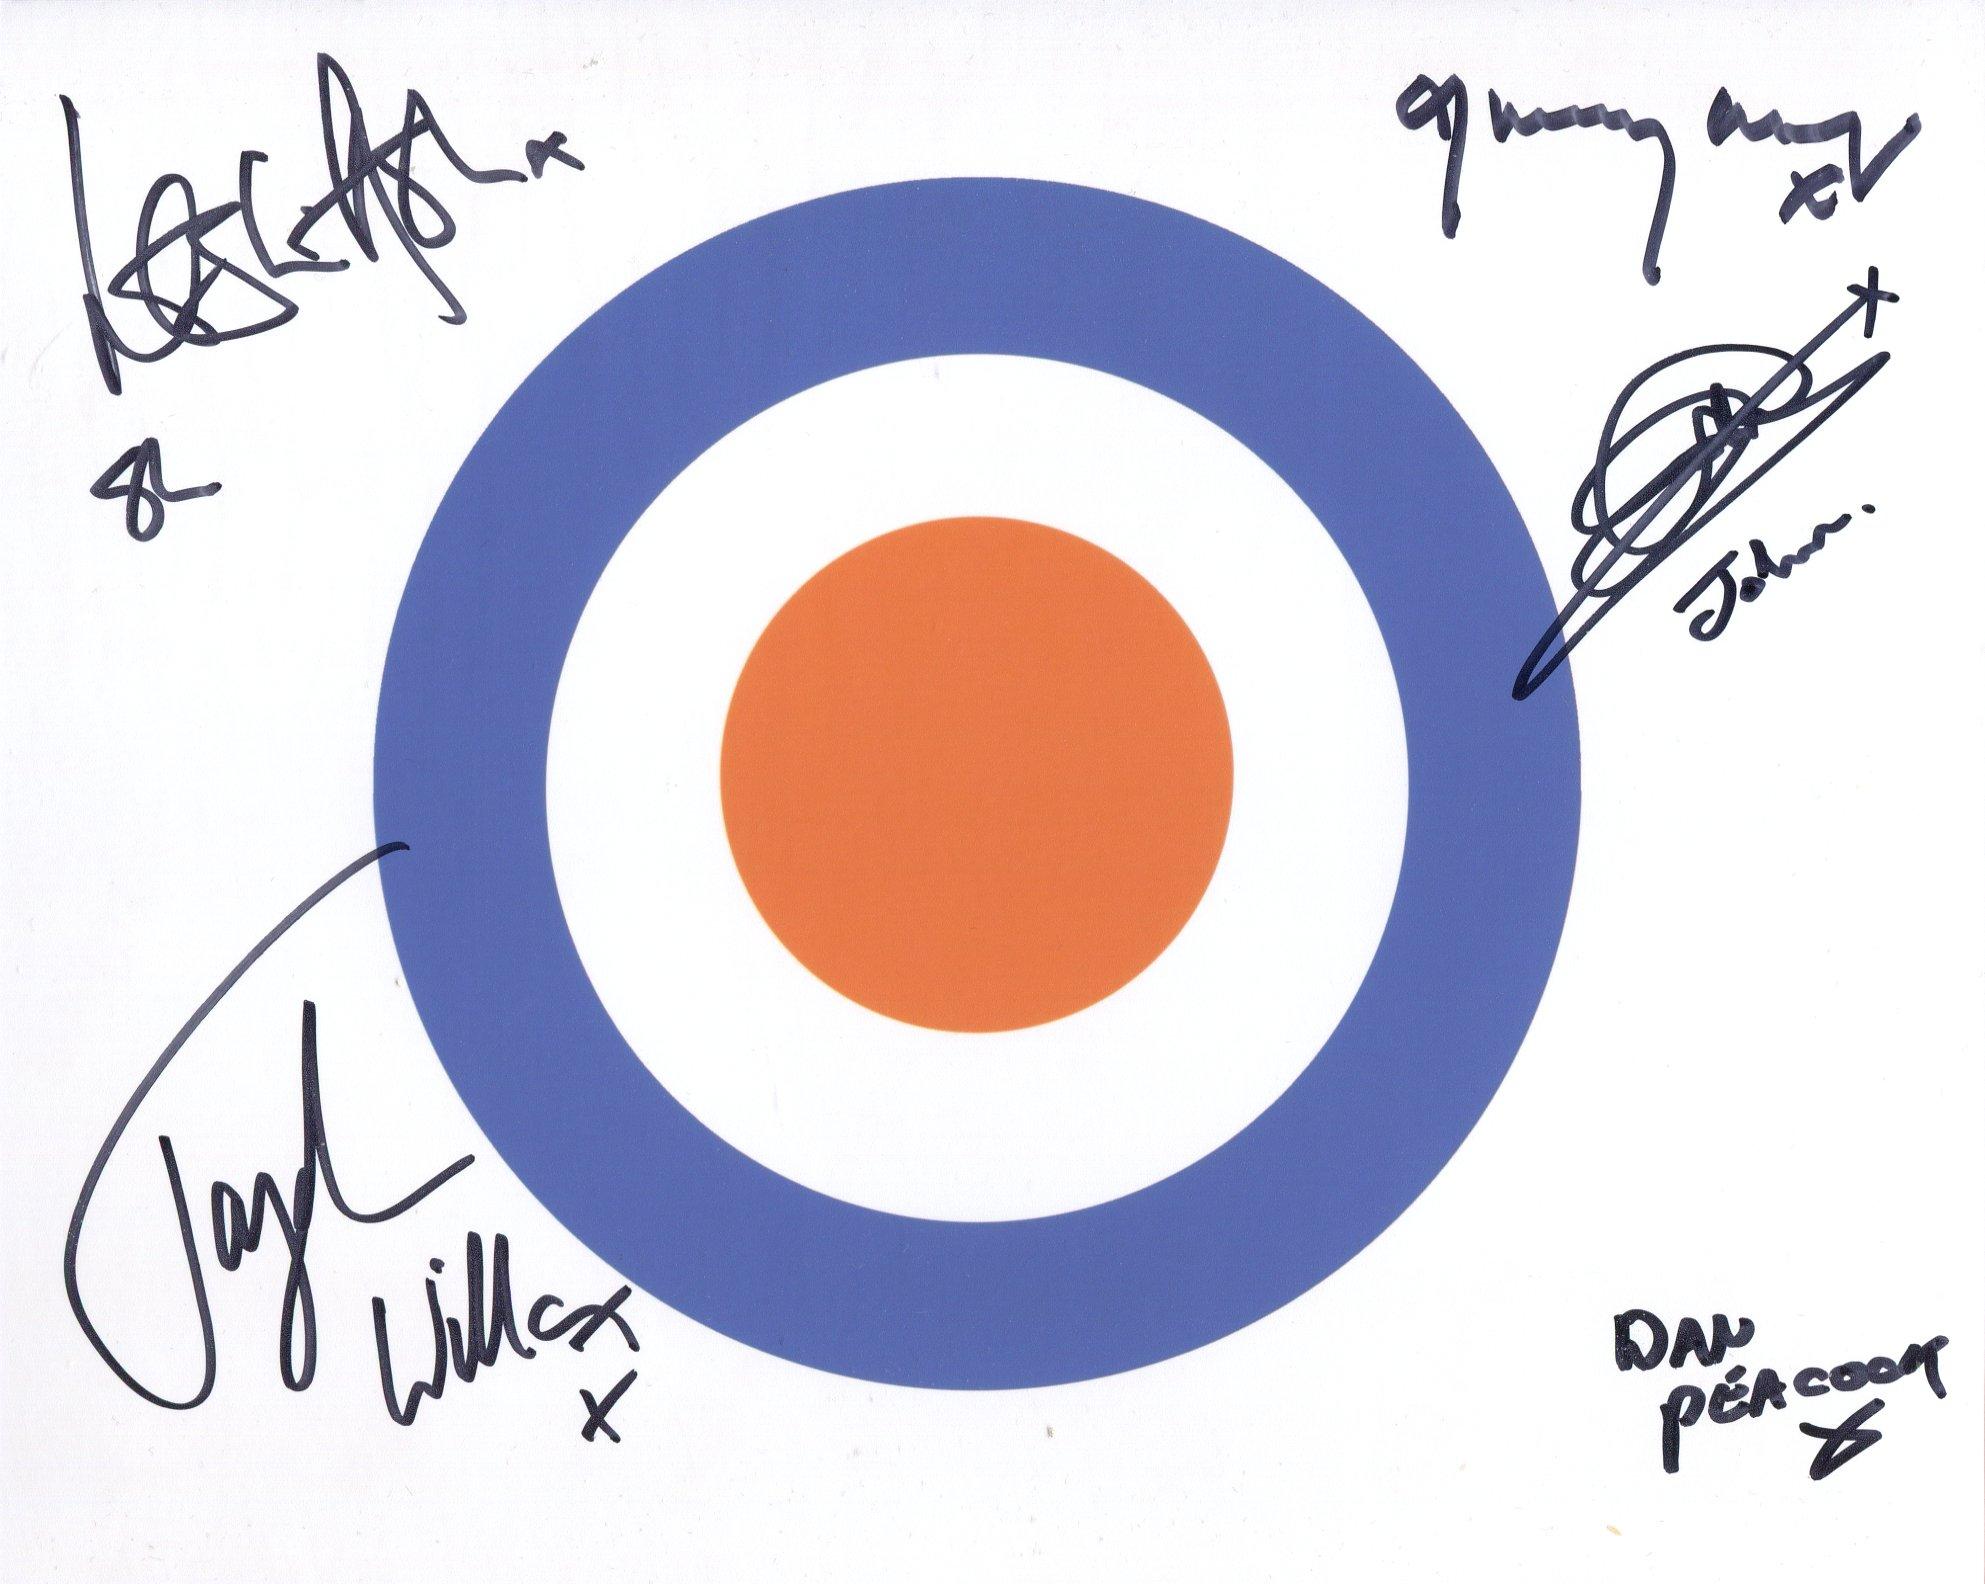 Quadrophenia. 8x10 photo from the classic British musical movie Quadrophenia signed by actors Leslie